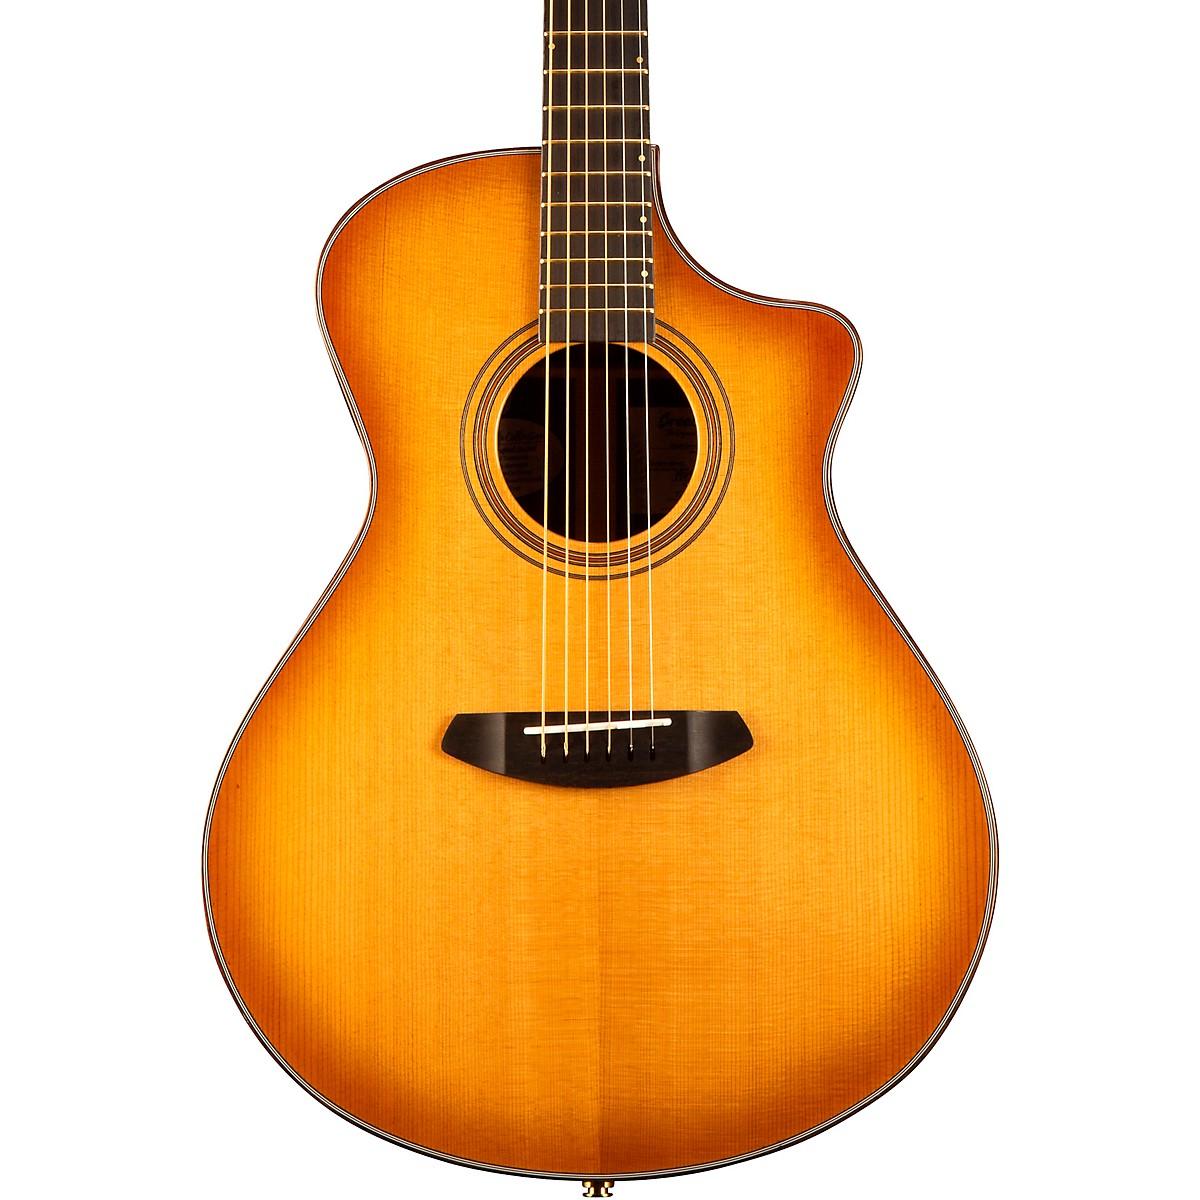 Breedlove Organic Collection Artista Granadillo Concerto Cutaway CE Acoustic-Electric Guitar